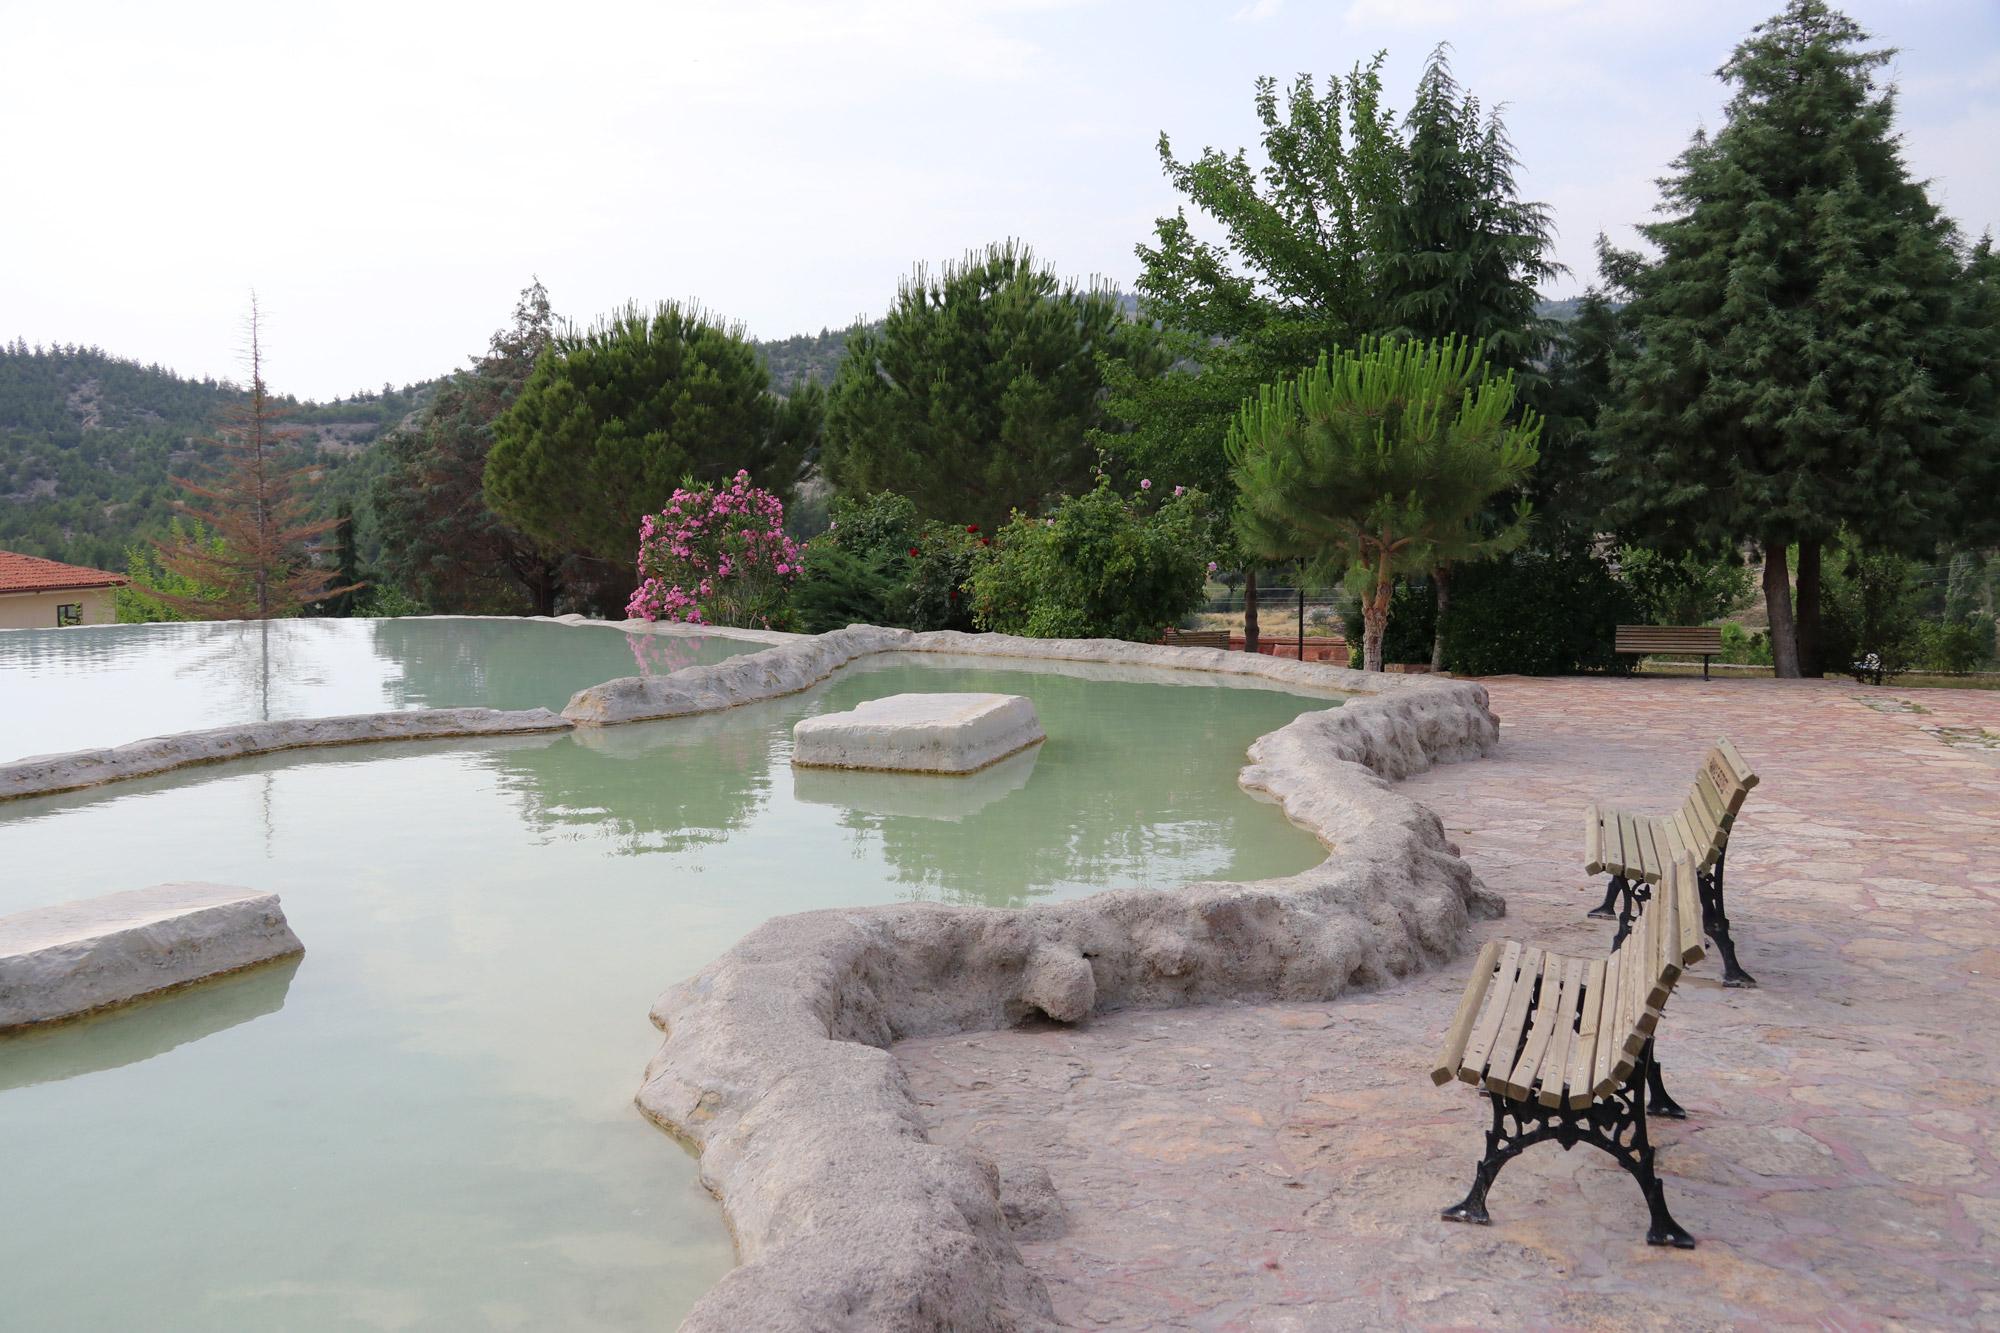 Turkije reisverslag: Pamukkale en Hiërapolis - Karahayit Spa Center